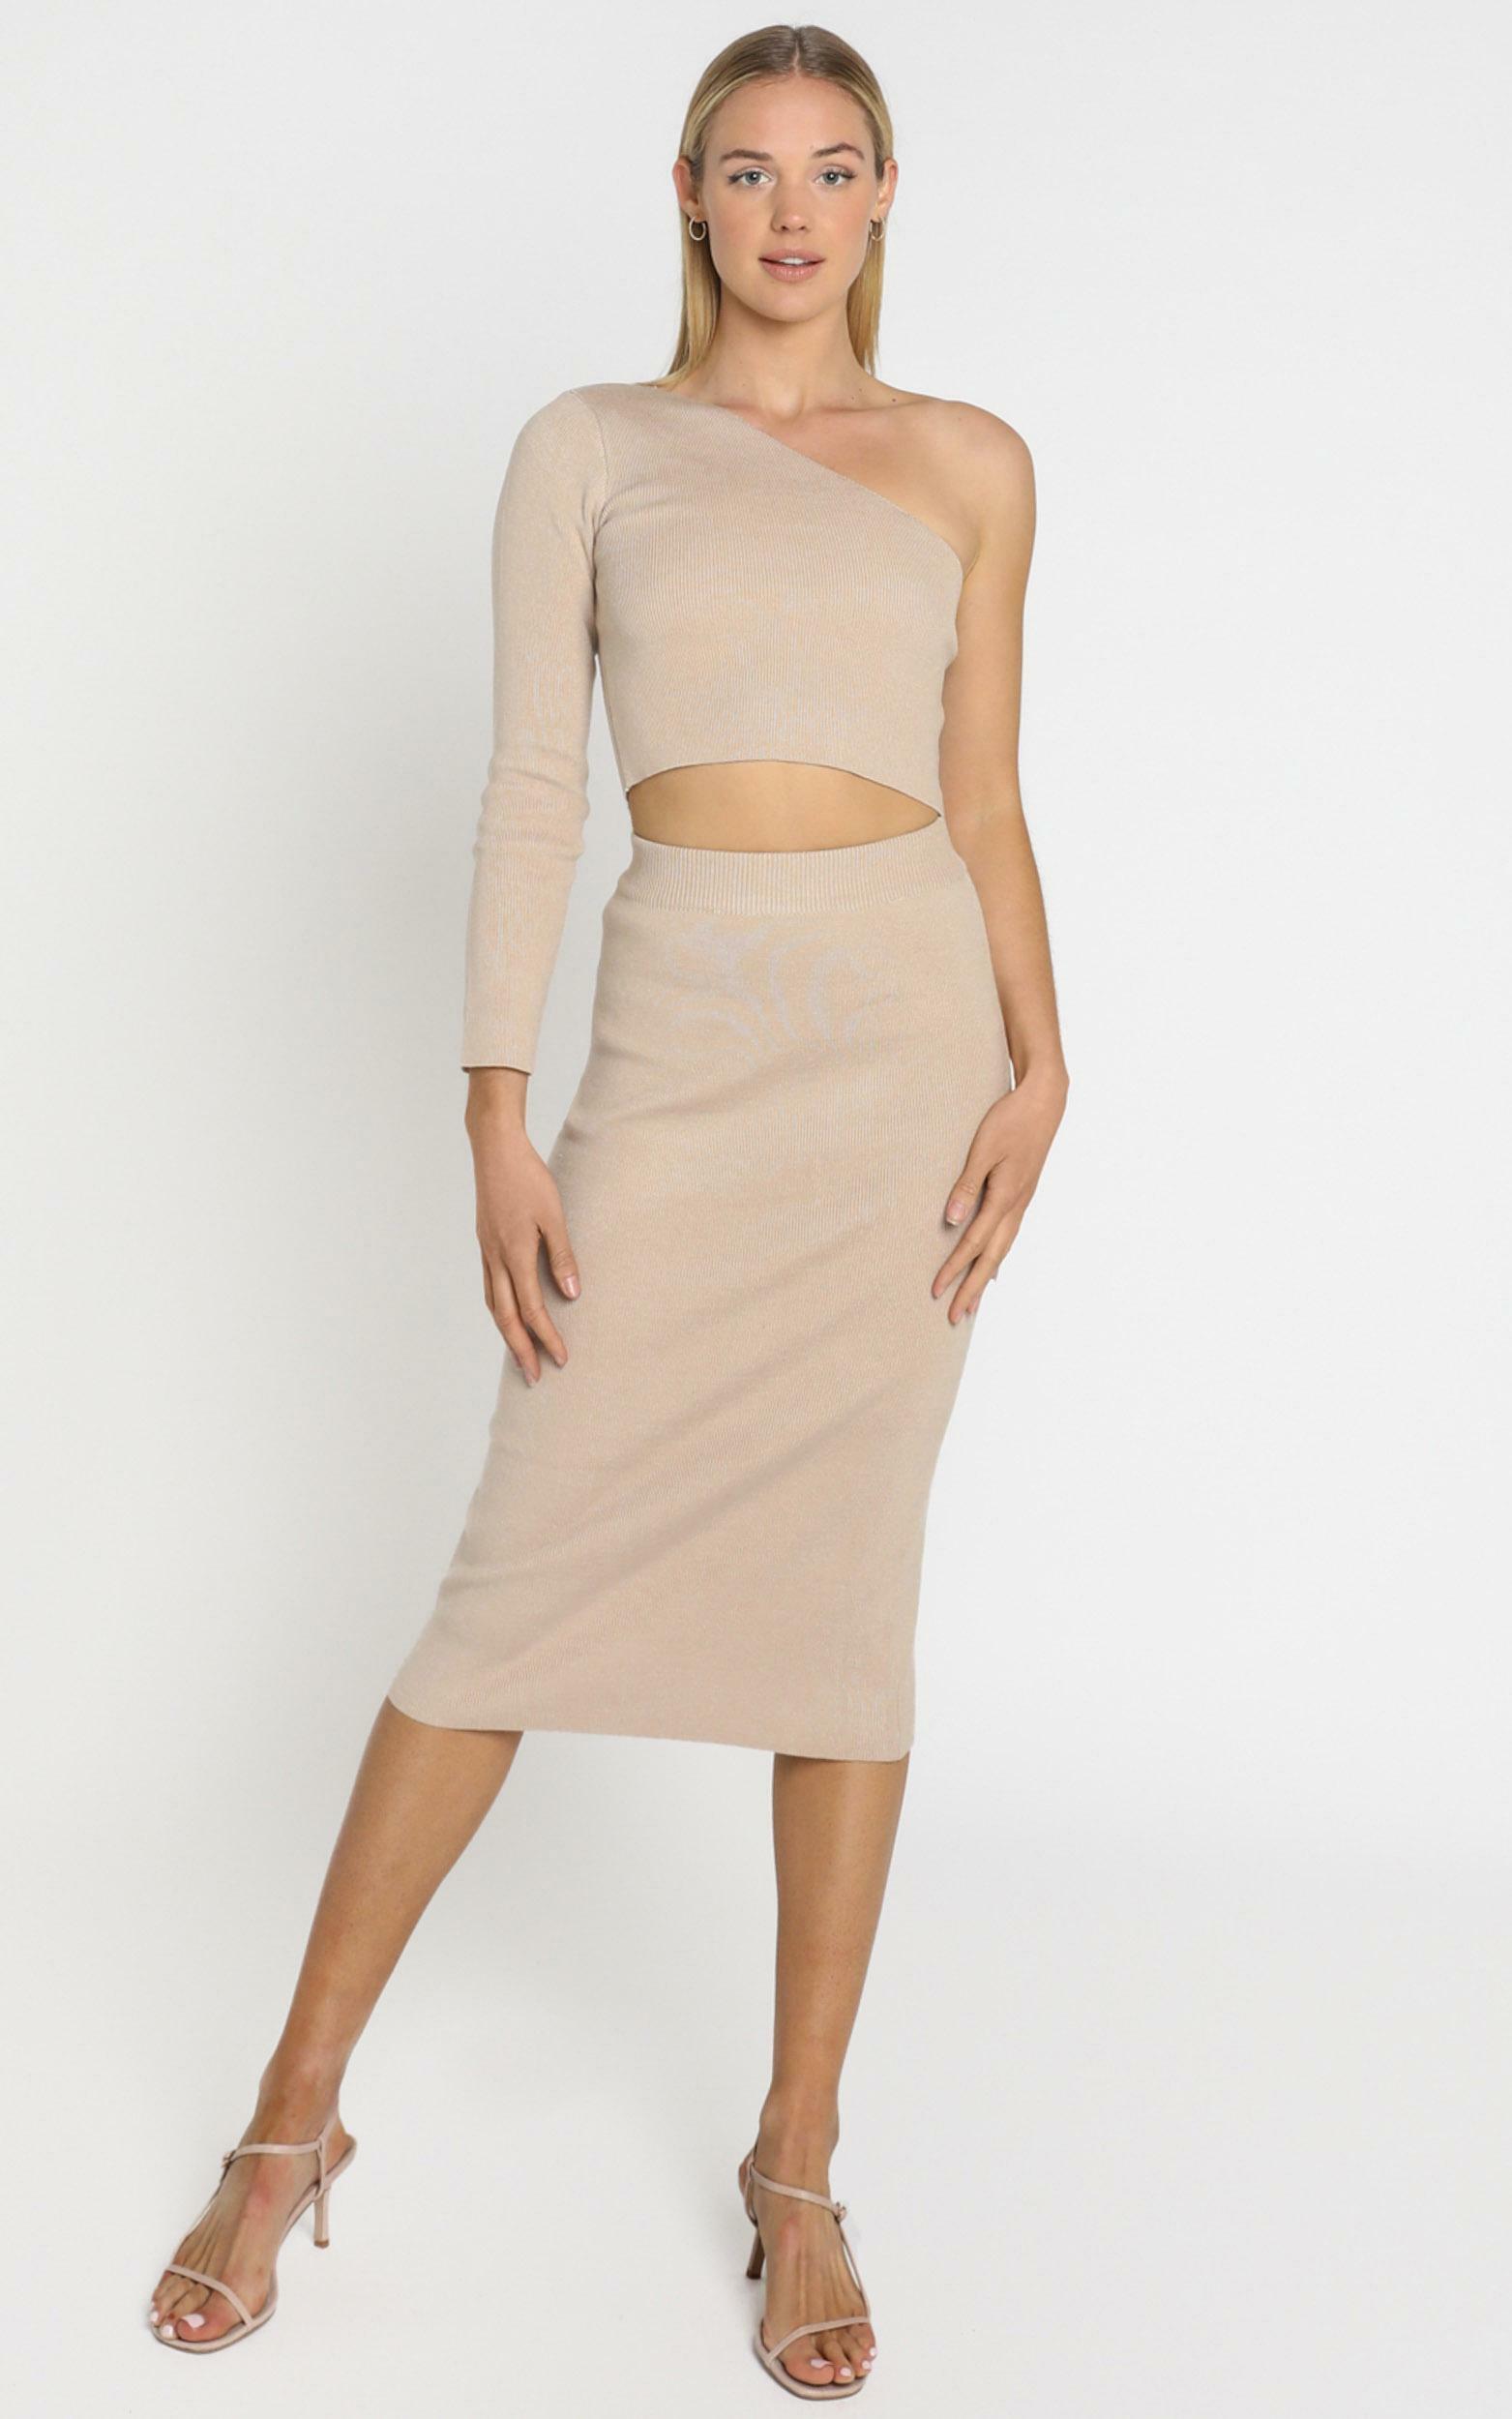 Walker Skirt in Beige - 8 (S), Beige, hi-res image number null